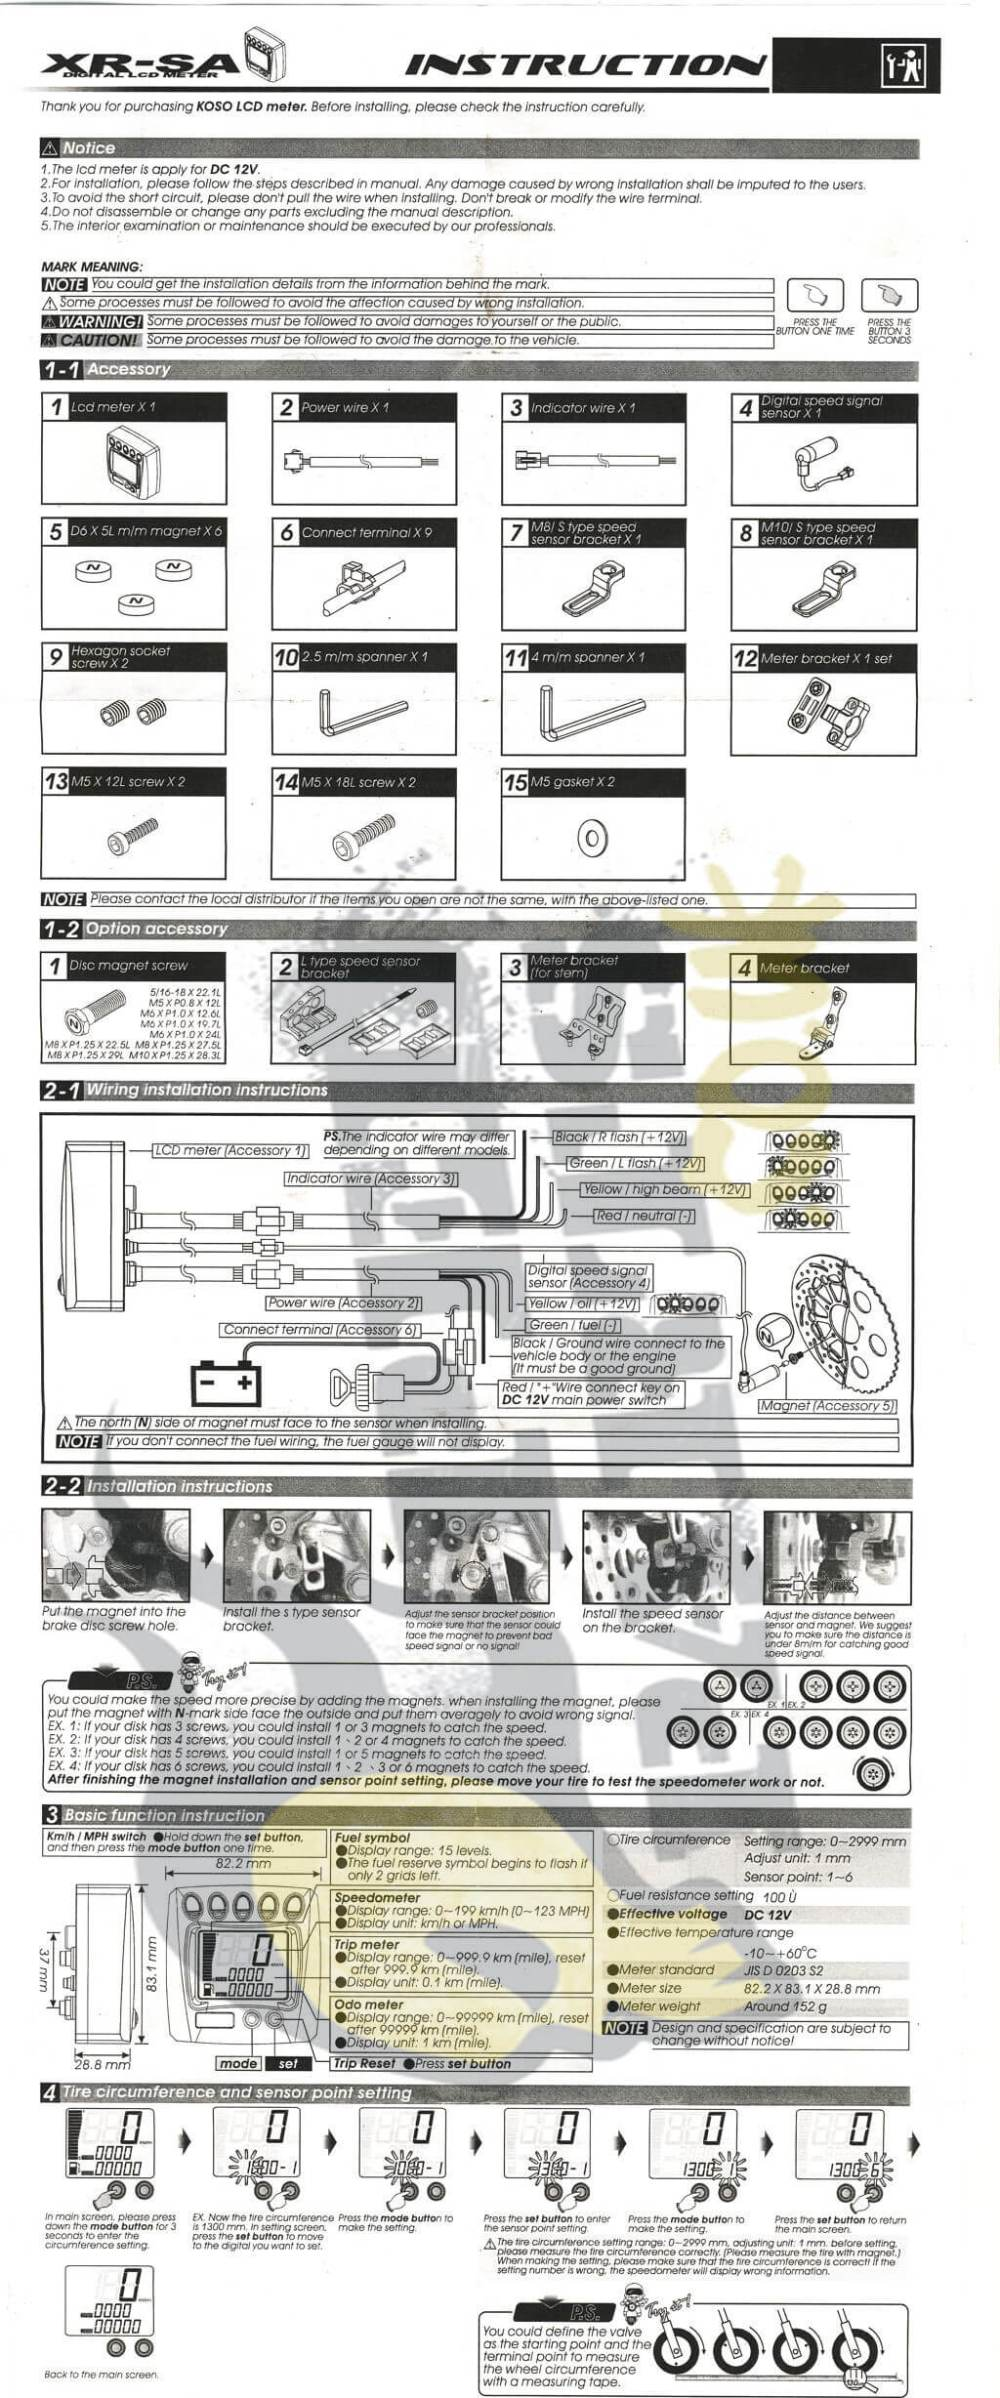 medium resolution of koso digital speedometer clocks pedparts uk electric motor wiring diagram installation instructions wiring diagram